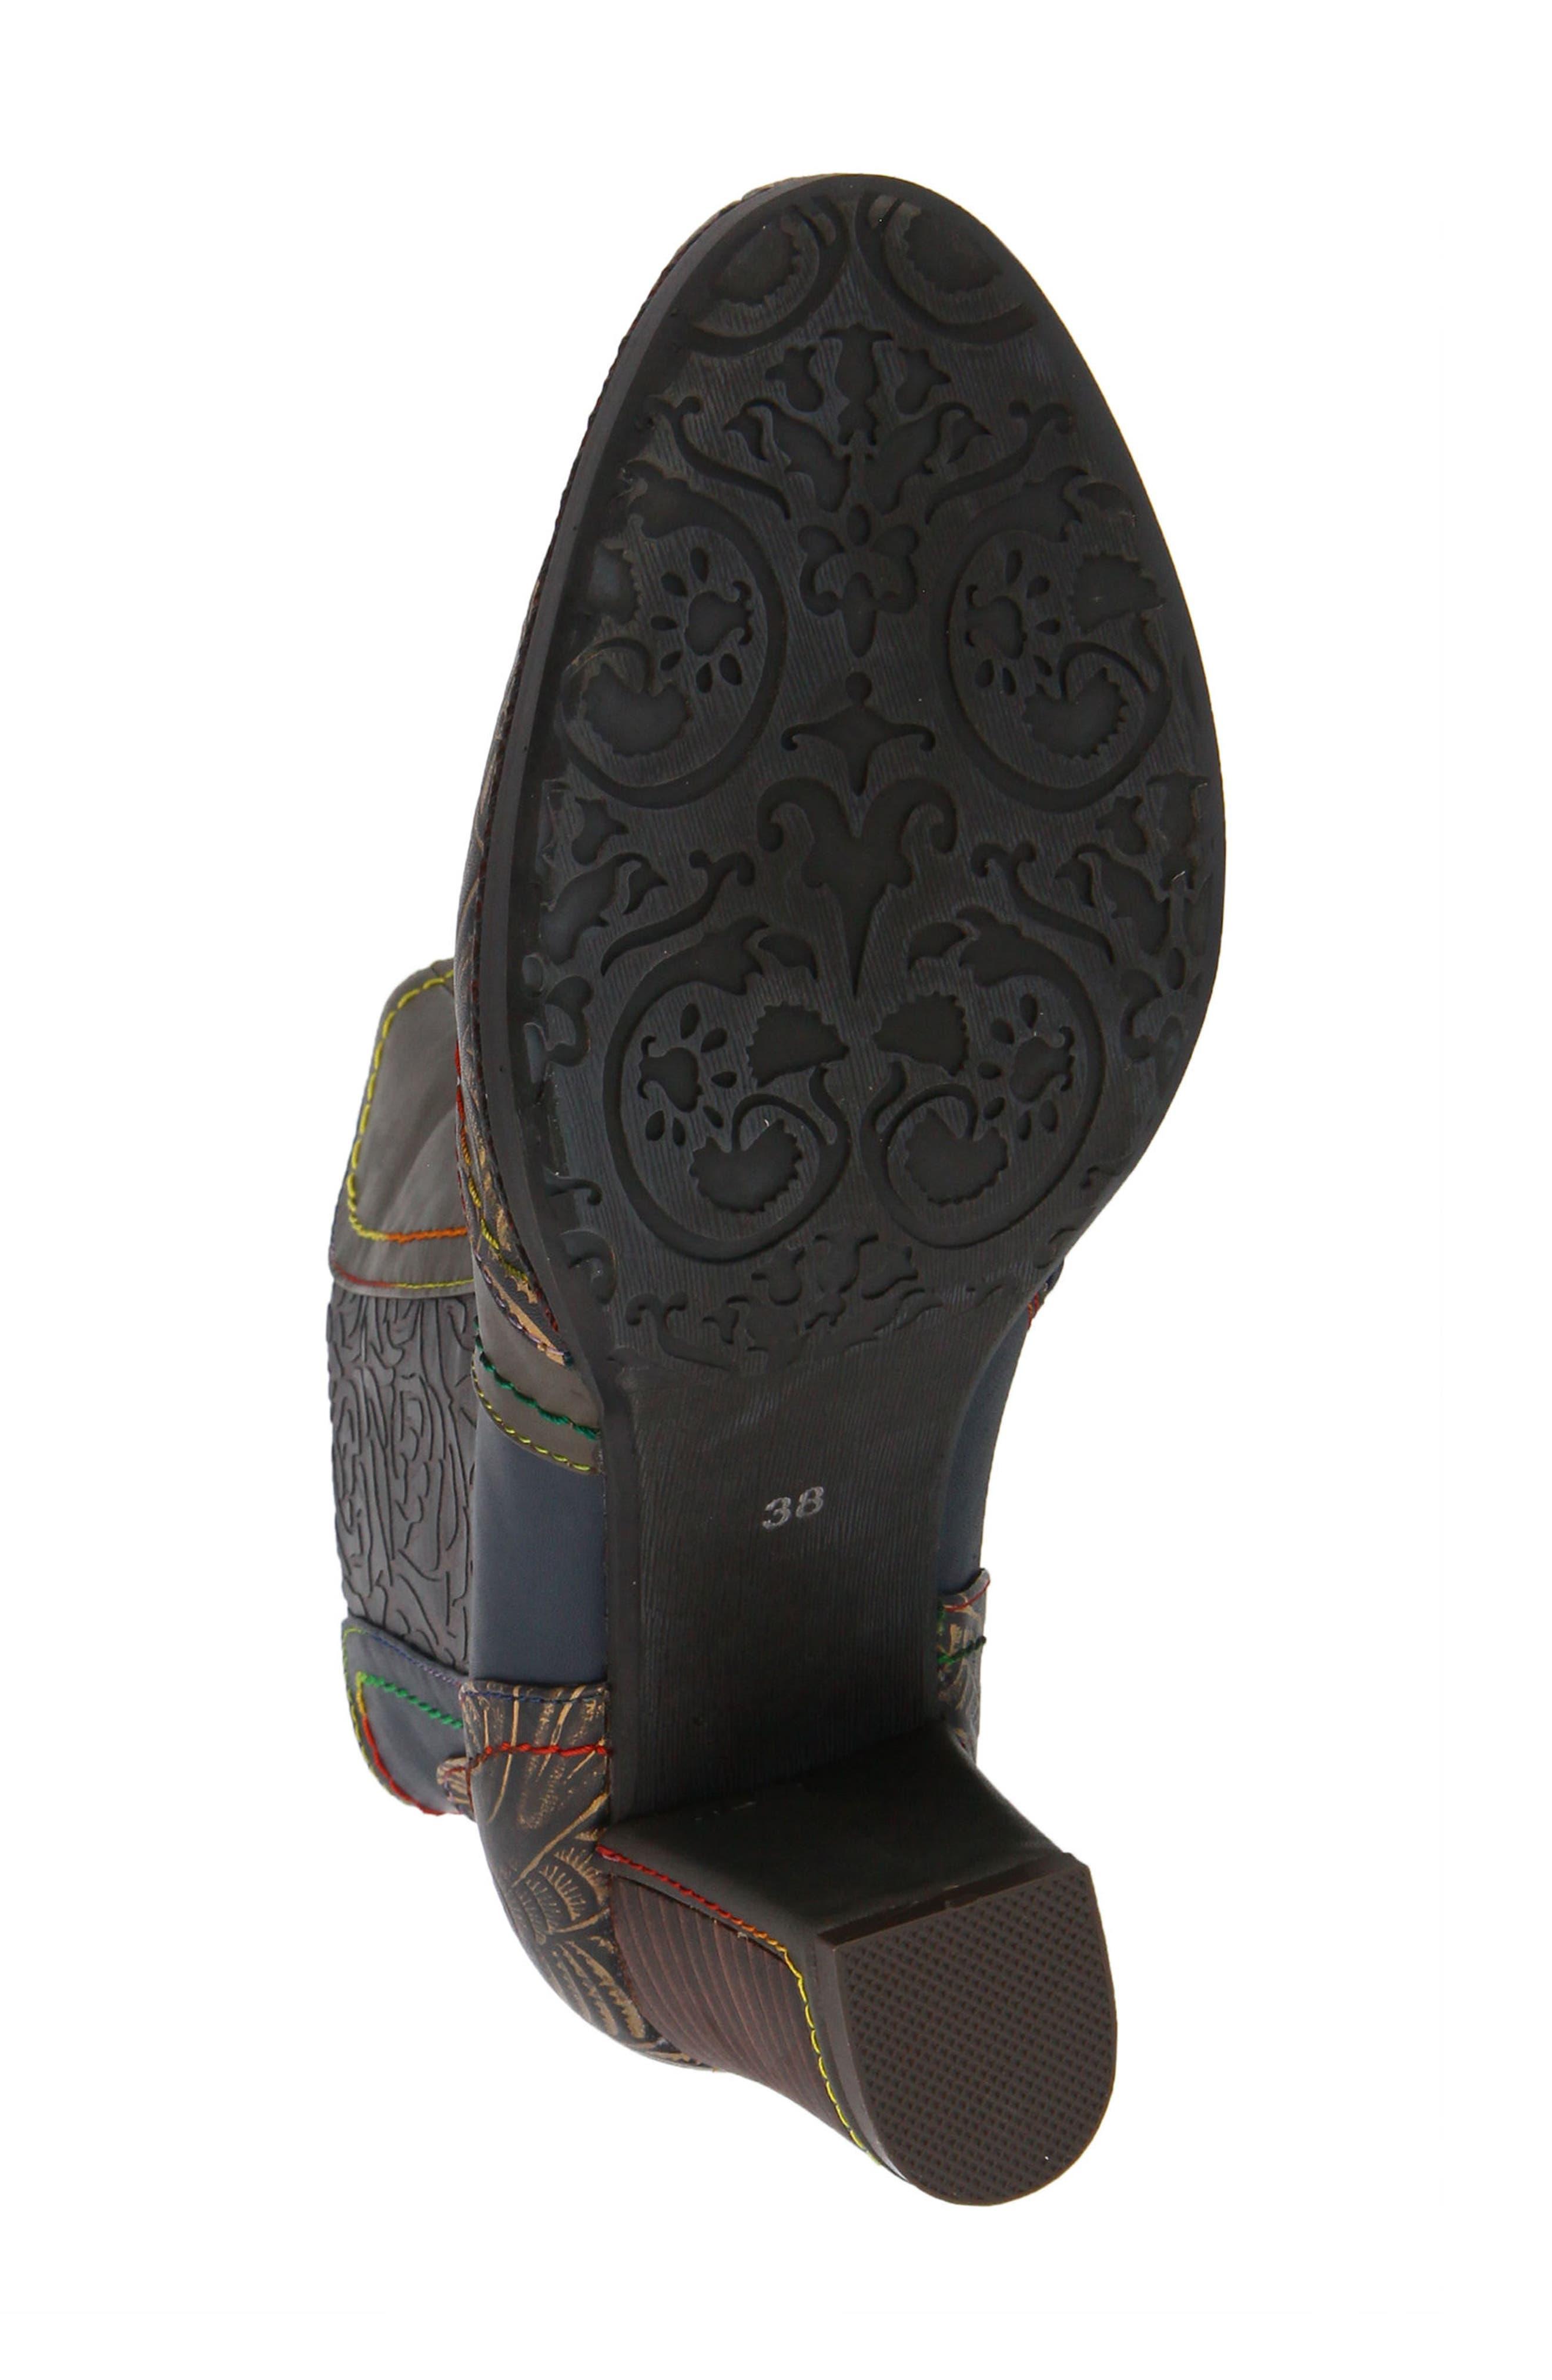 L'Artiste Santana Boot,                             Alternate thumbnail 5, color,                             Olive Green Leather